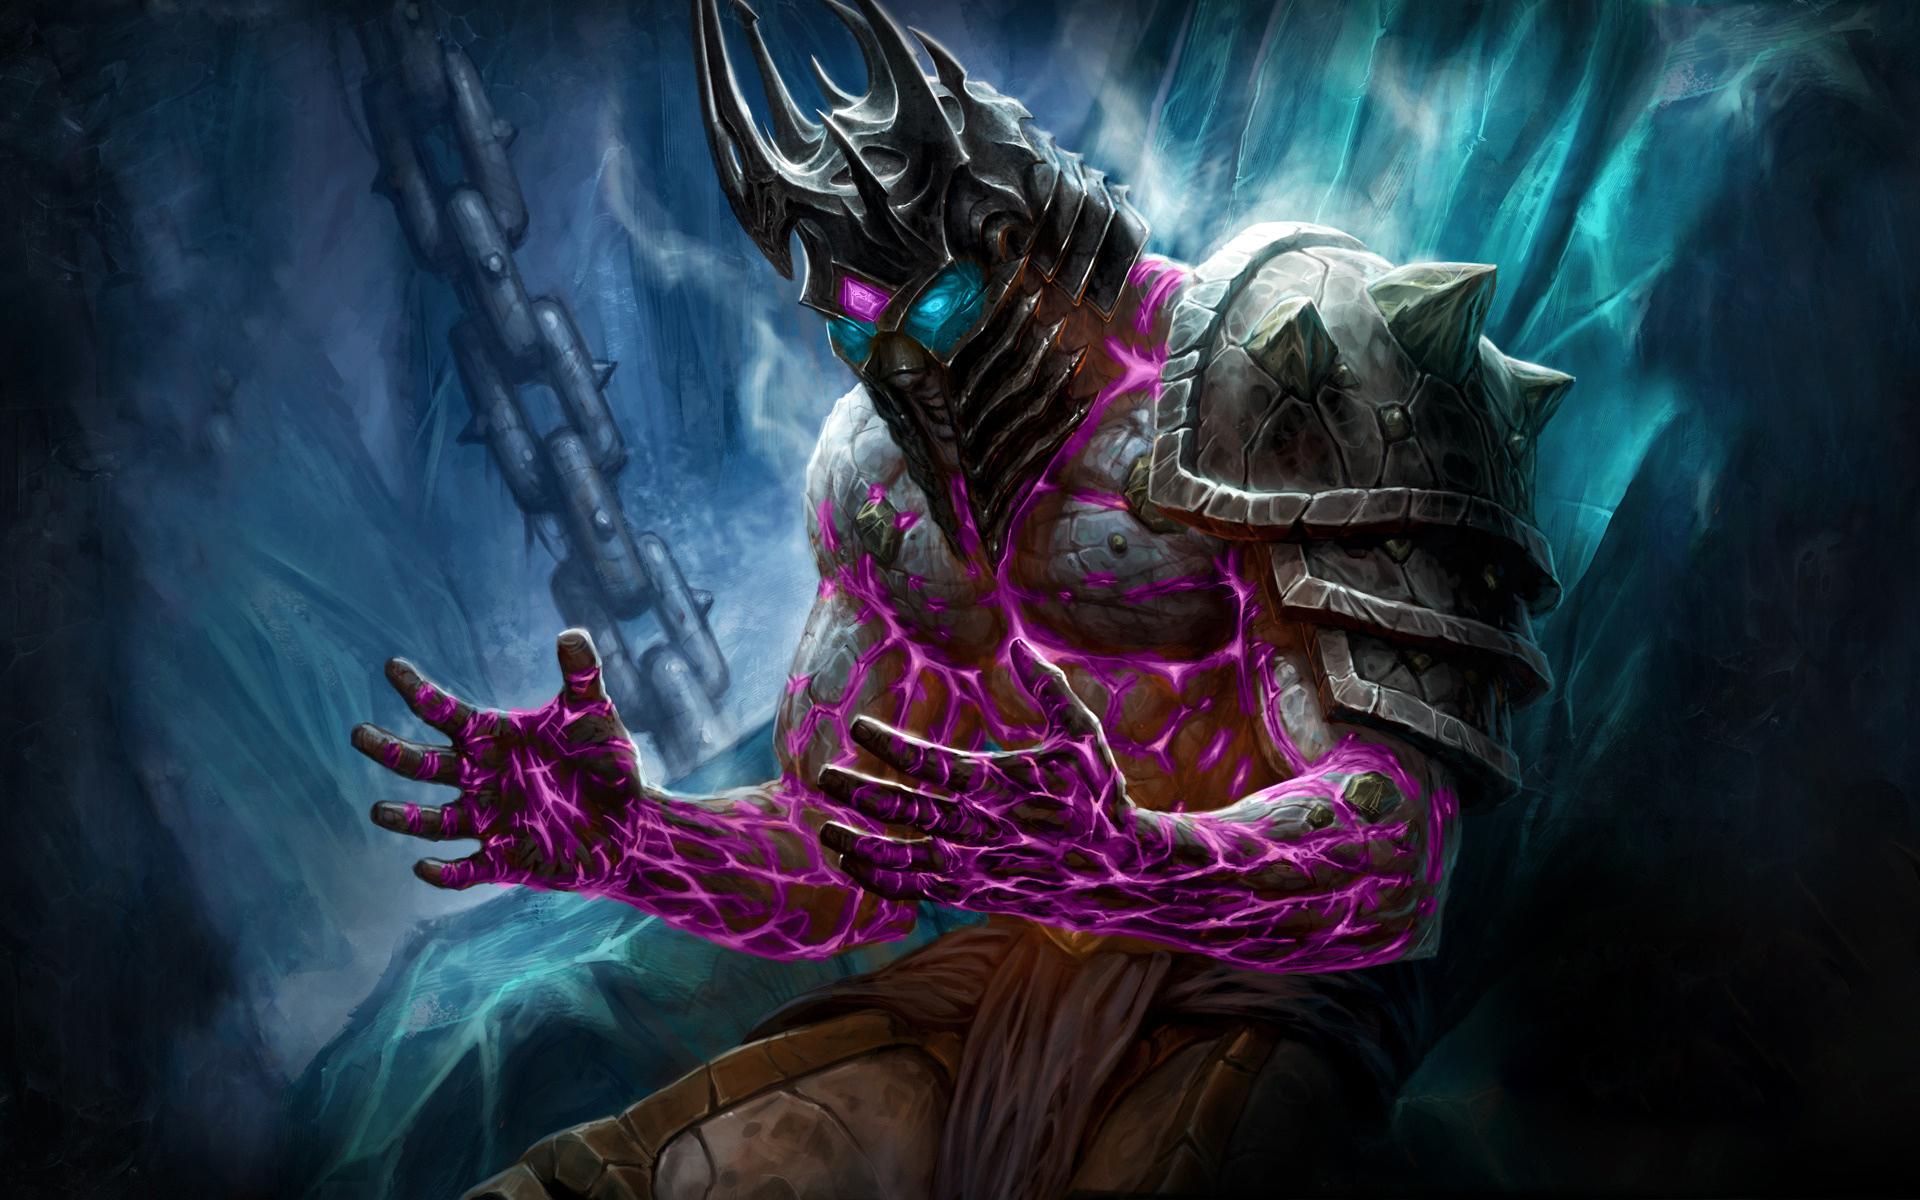 games-world-of-warcraft-13838.jpg